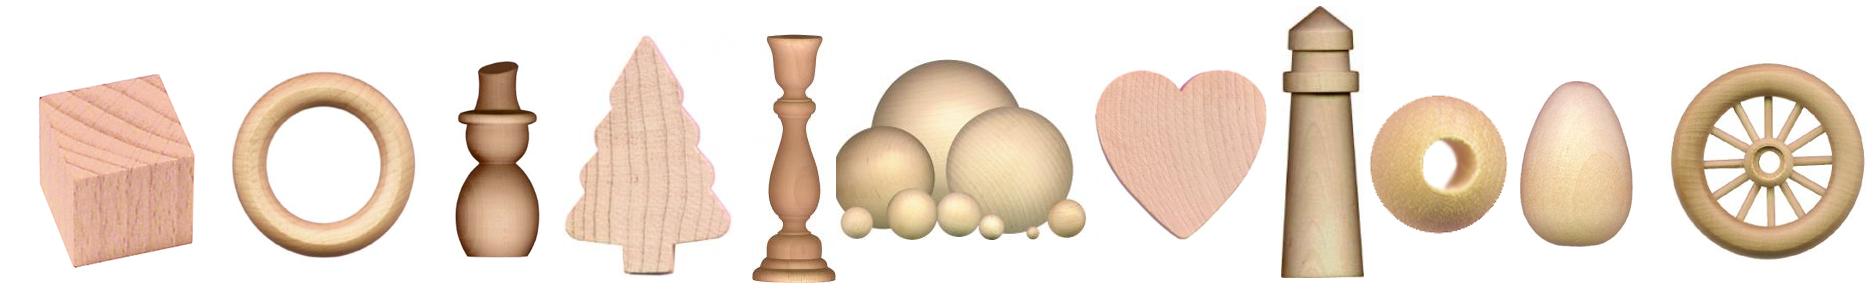 woodparts-wood-crafts